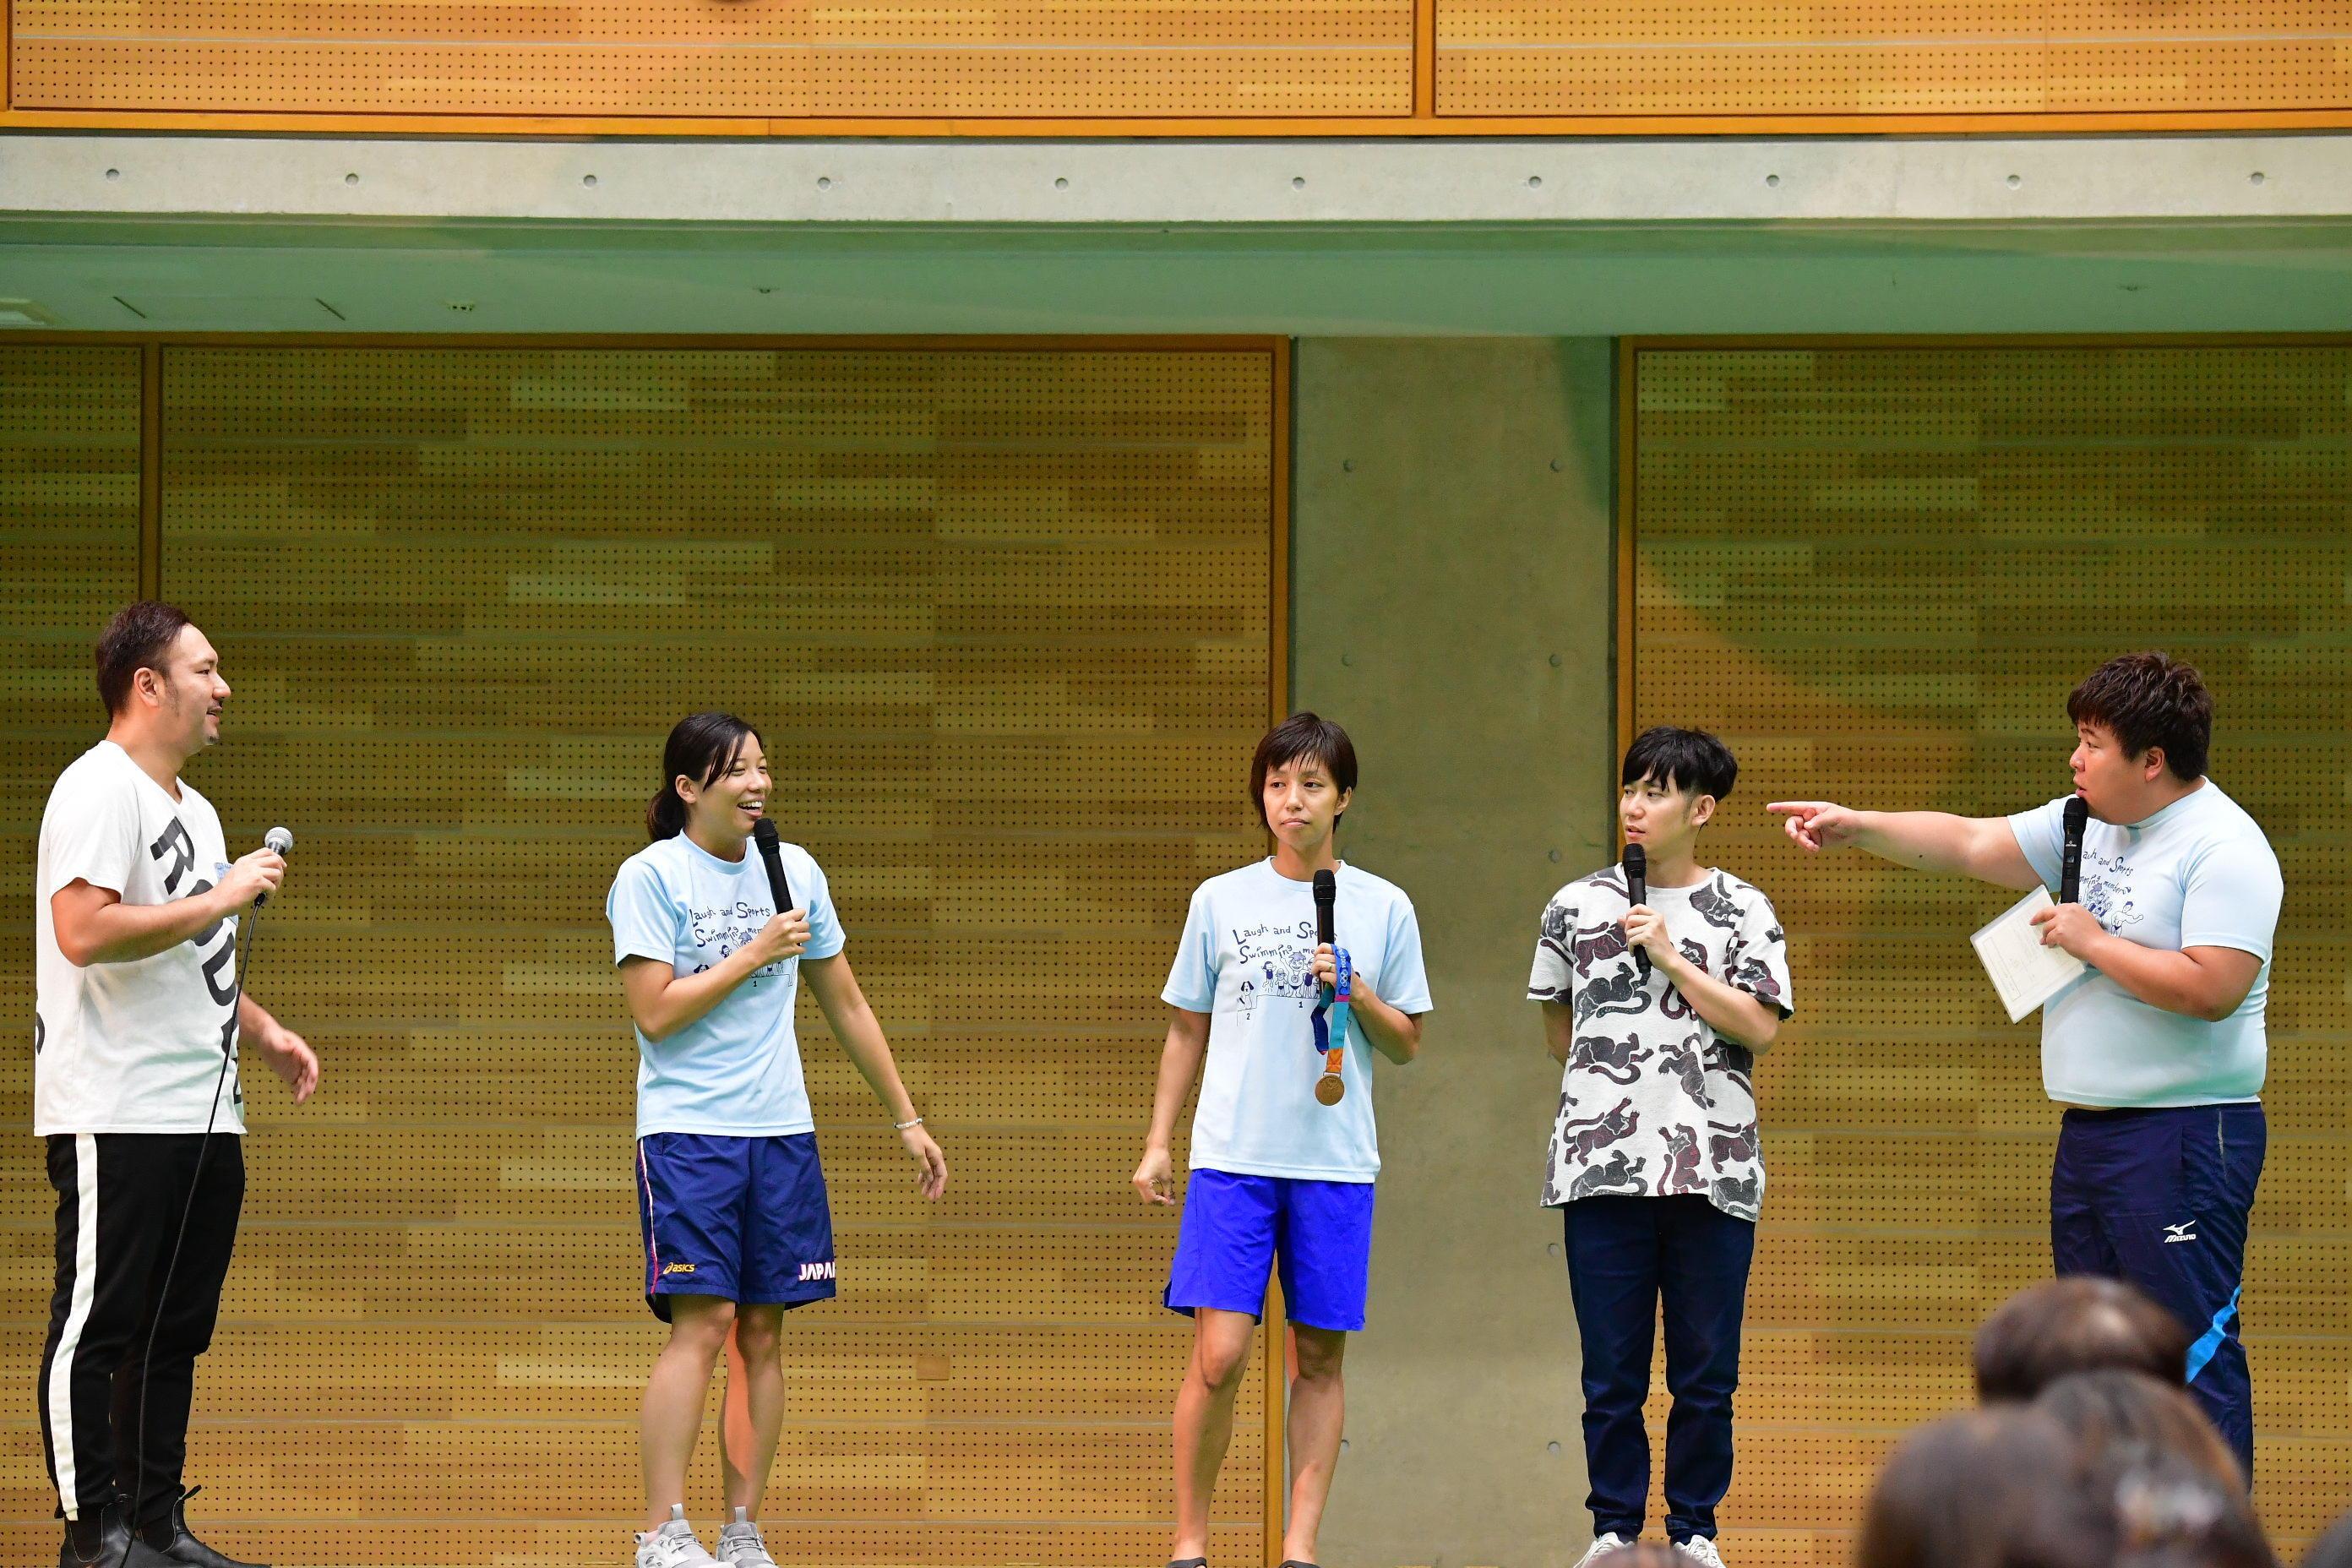 http://news.yoshimoto.co.jp/20180926011121-569ebeb16bdc944934c63557415dc90878302e68.jpg